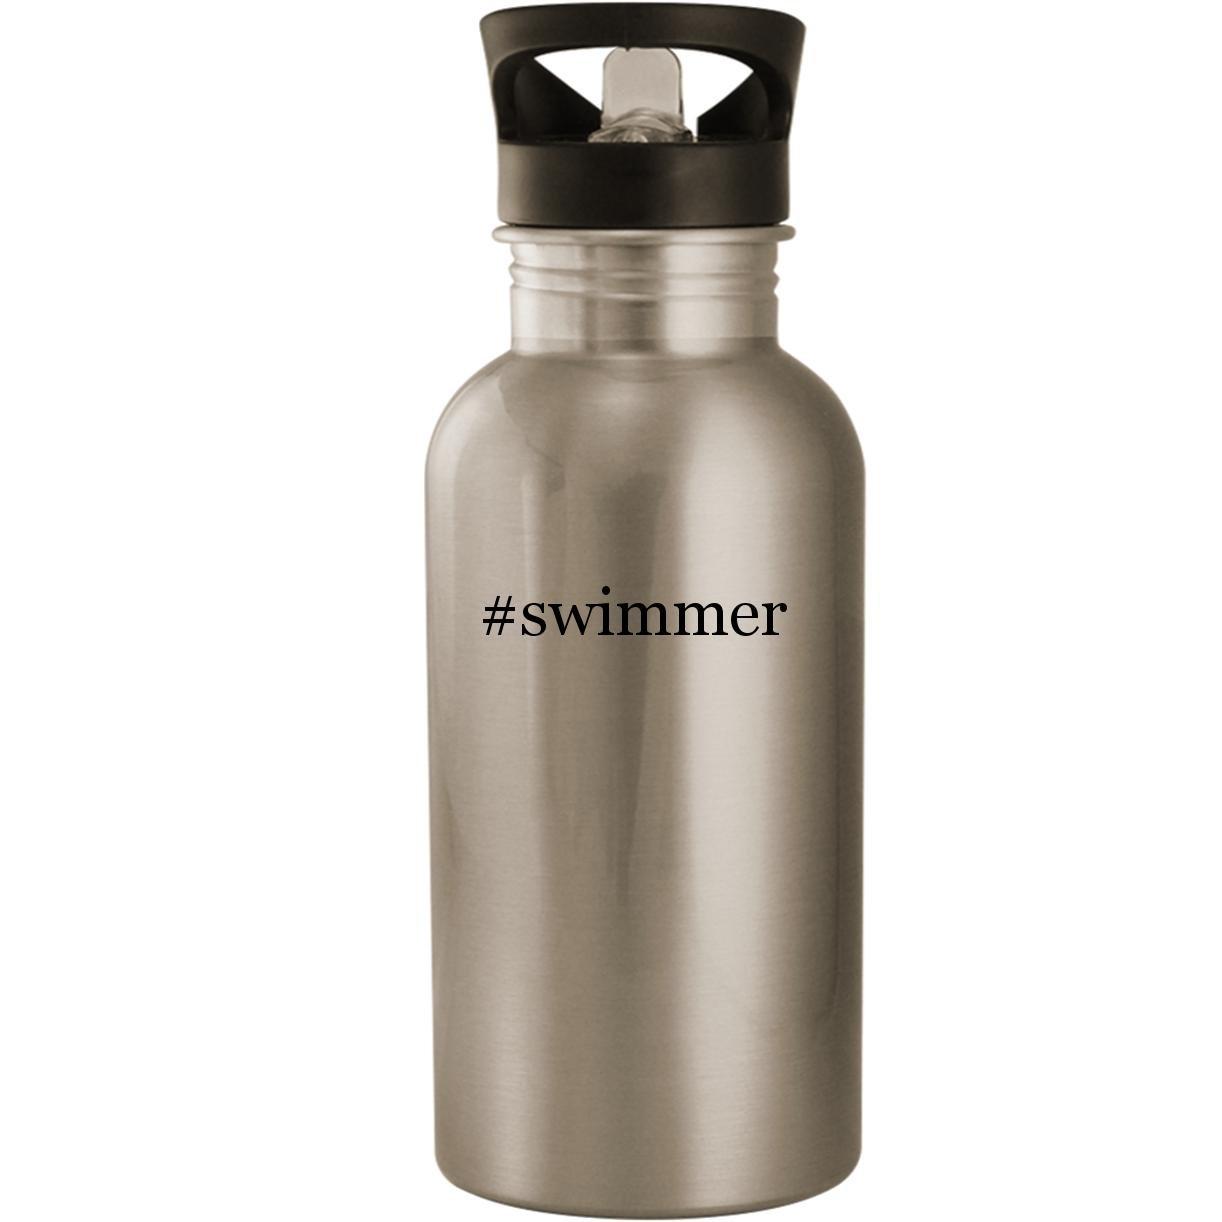 # Swimmer – ステンレススチール20oz Road Ready水ボトル シルバー US-C-07-18-02-056702-04-26-18-26 B07FT73FF8 シルバー